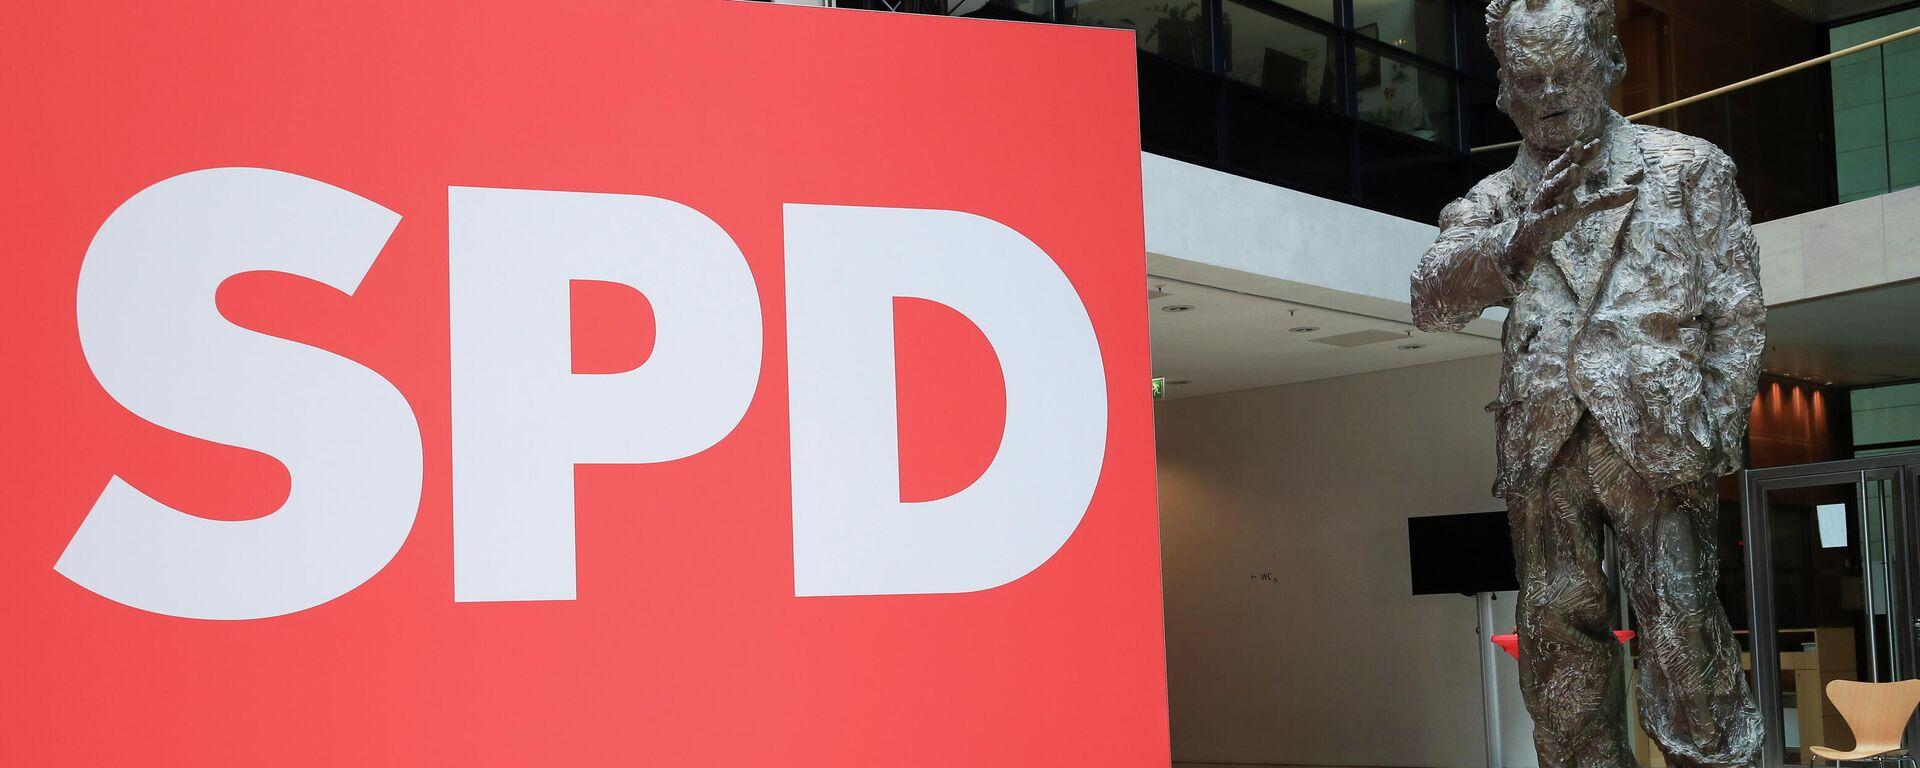 SPD-Fraktionstreffen - SNA, 1920, 30.09.2021